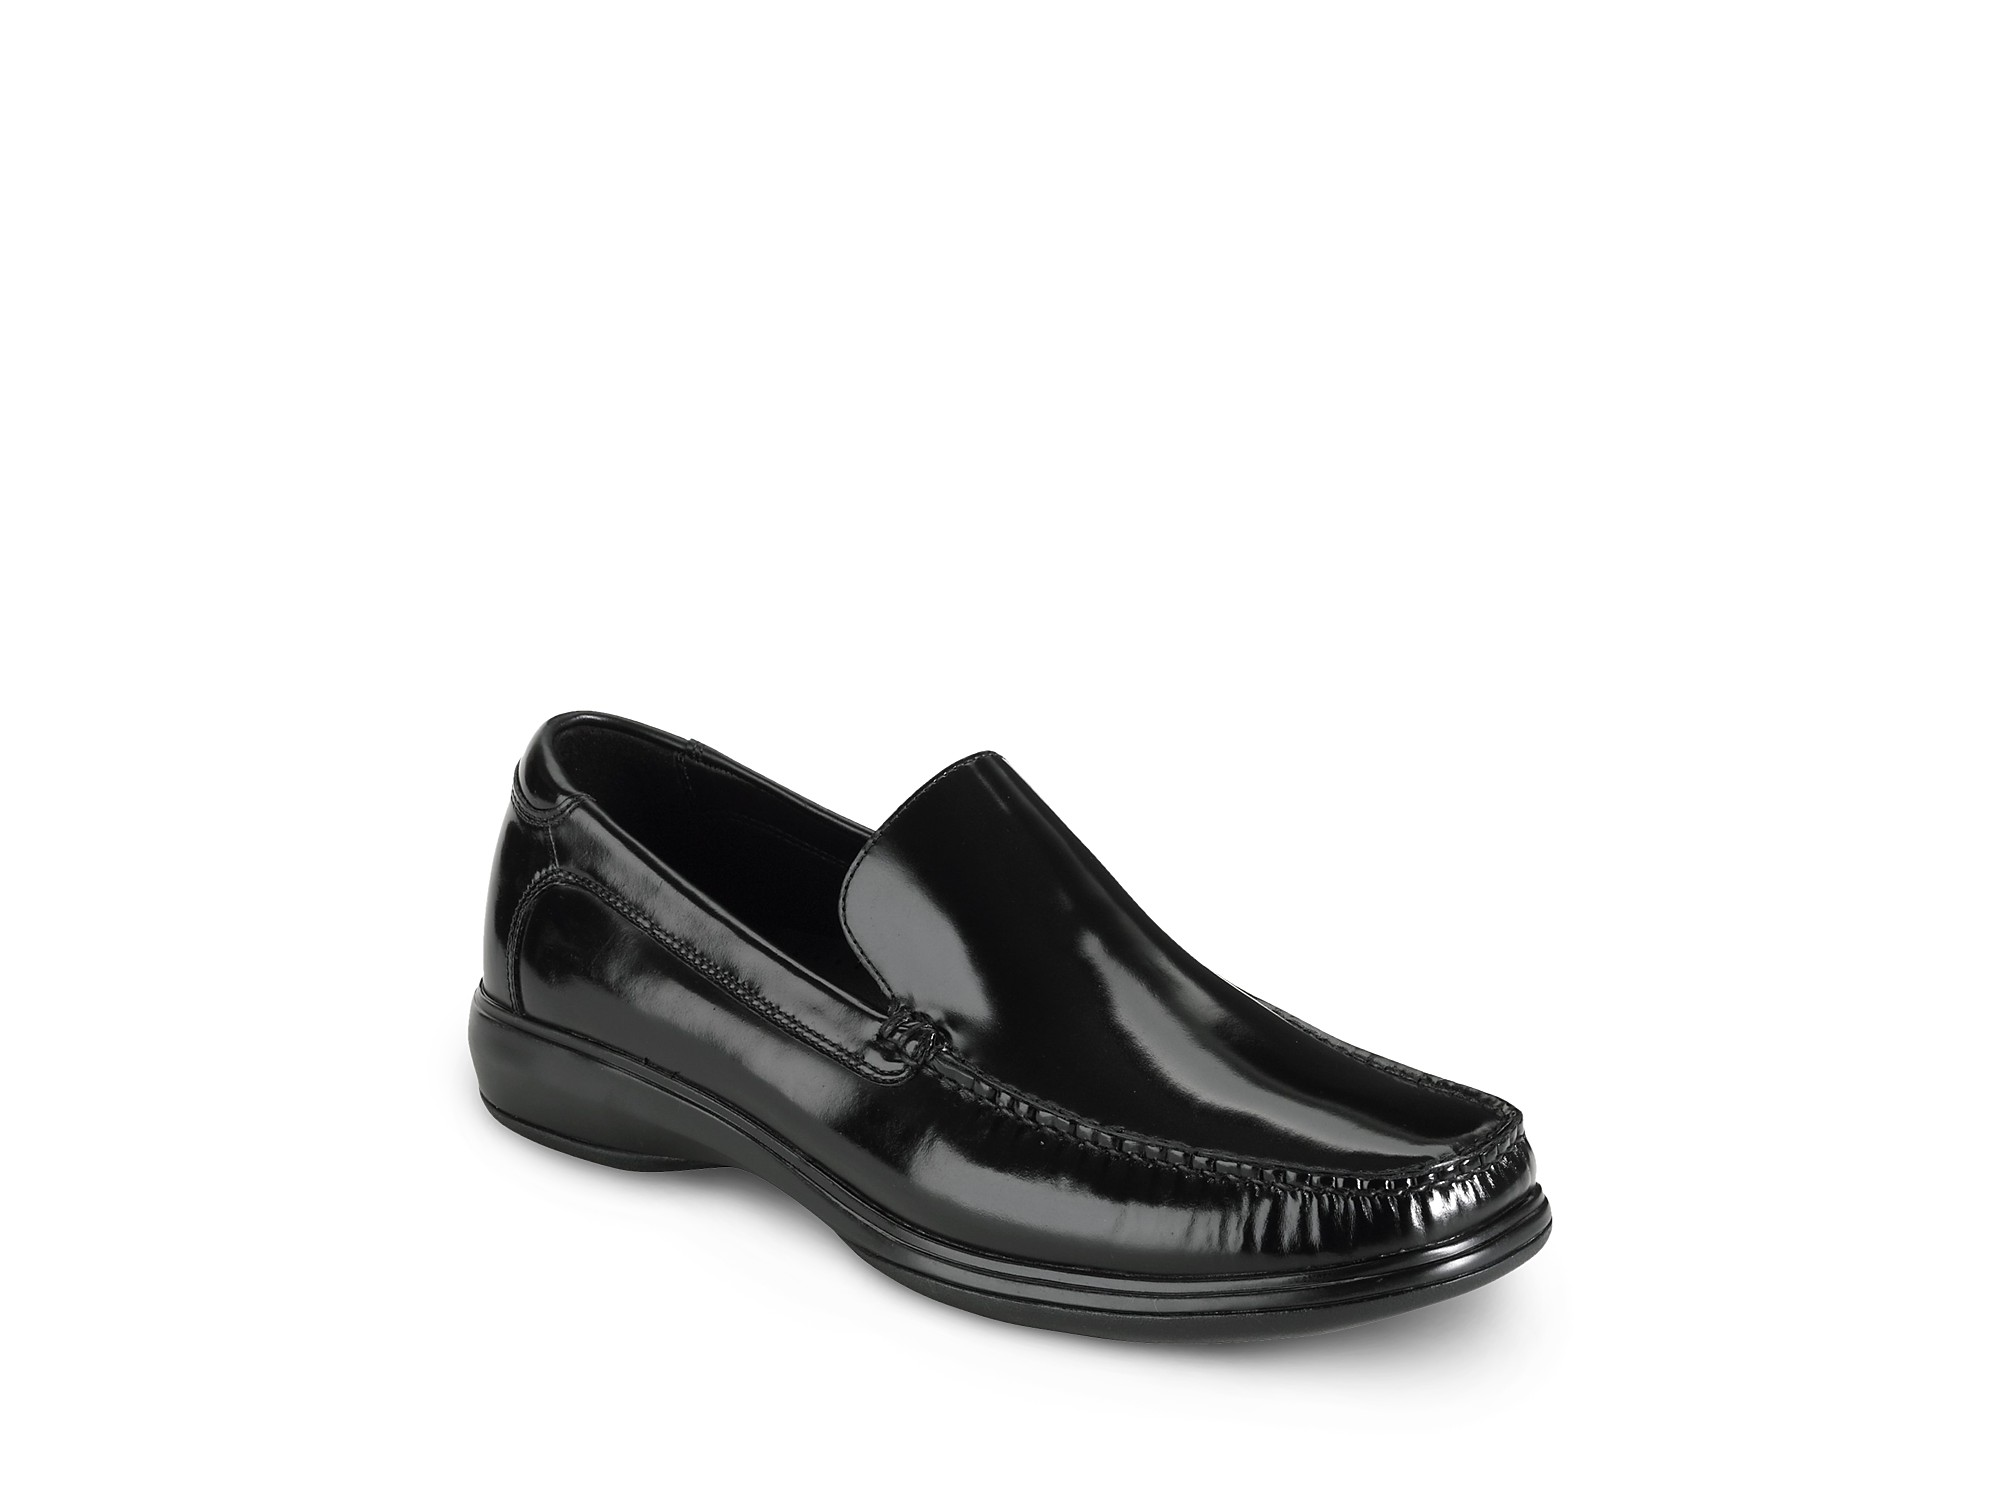 Asos Black Glitter Shoes